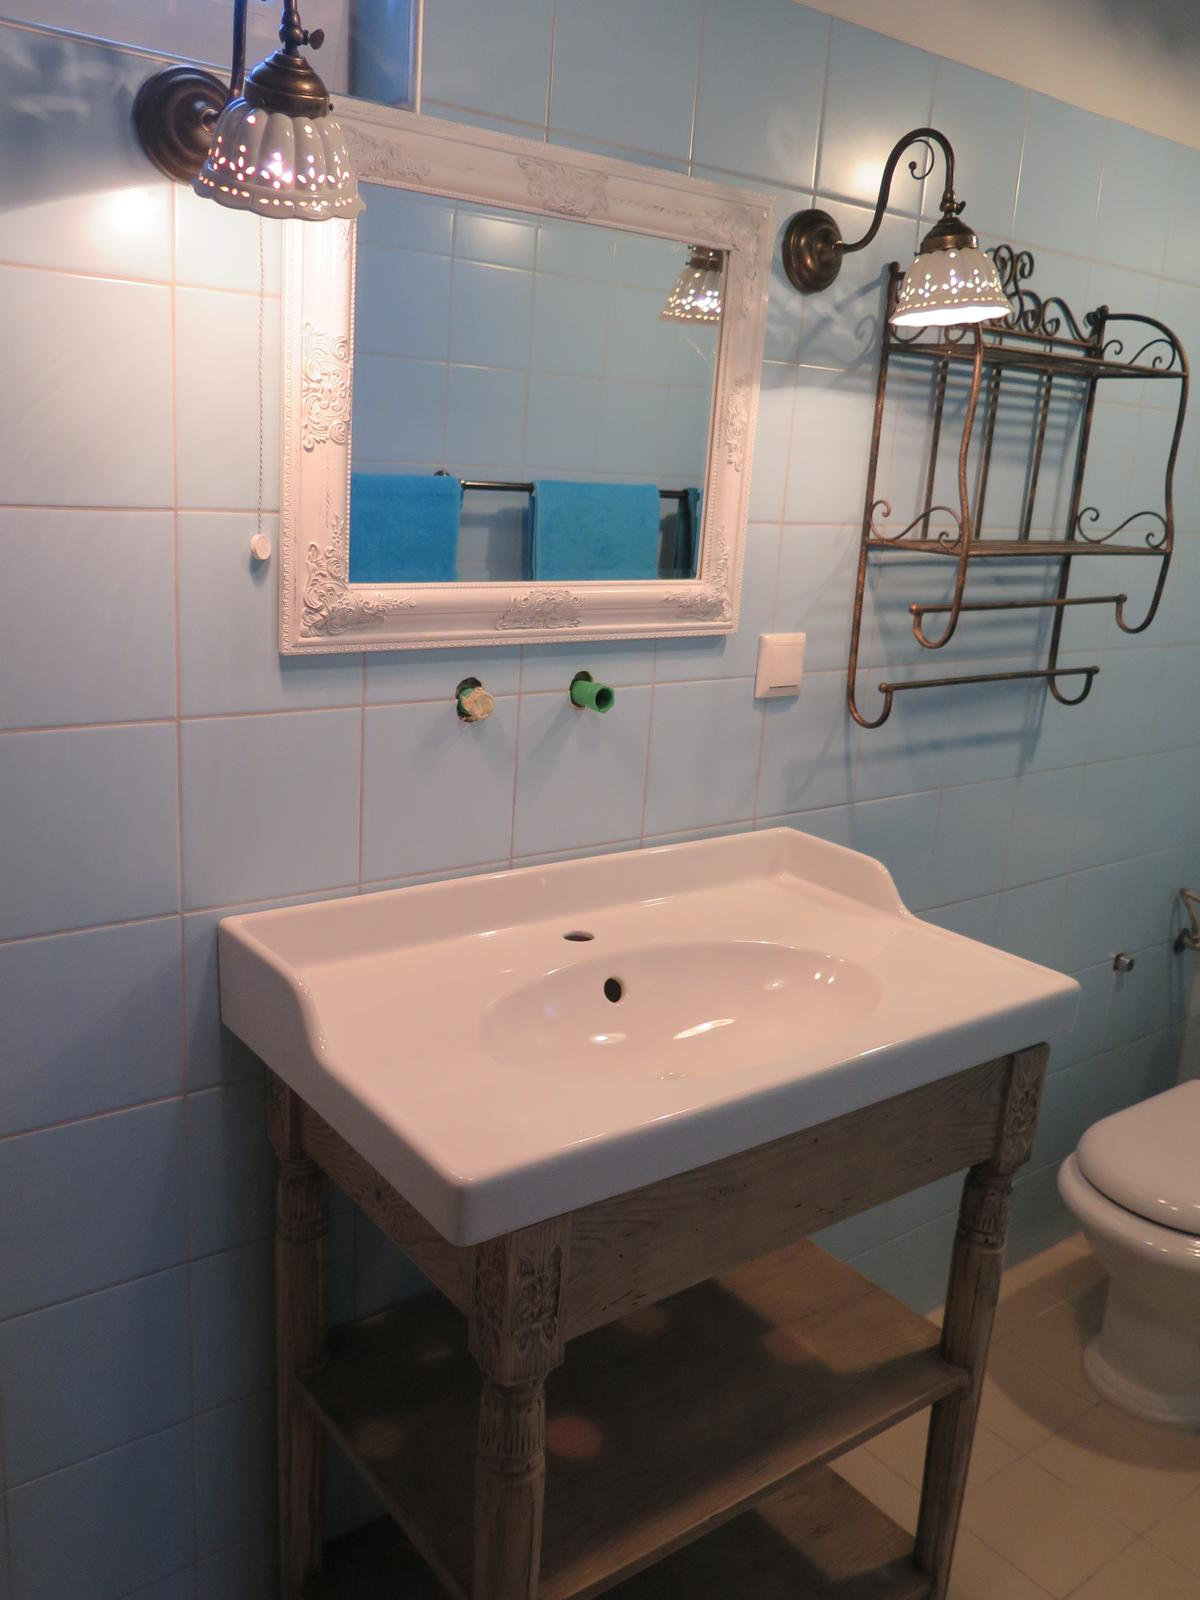 Naša stará a nová kúpelňa - Obrázok č. 2